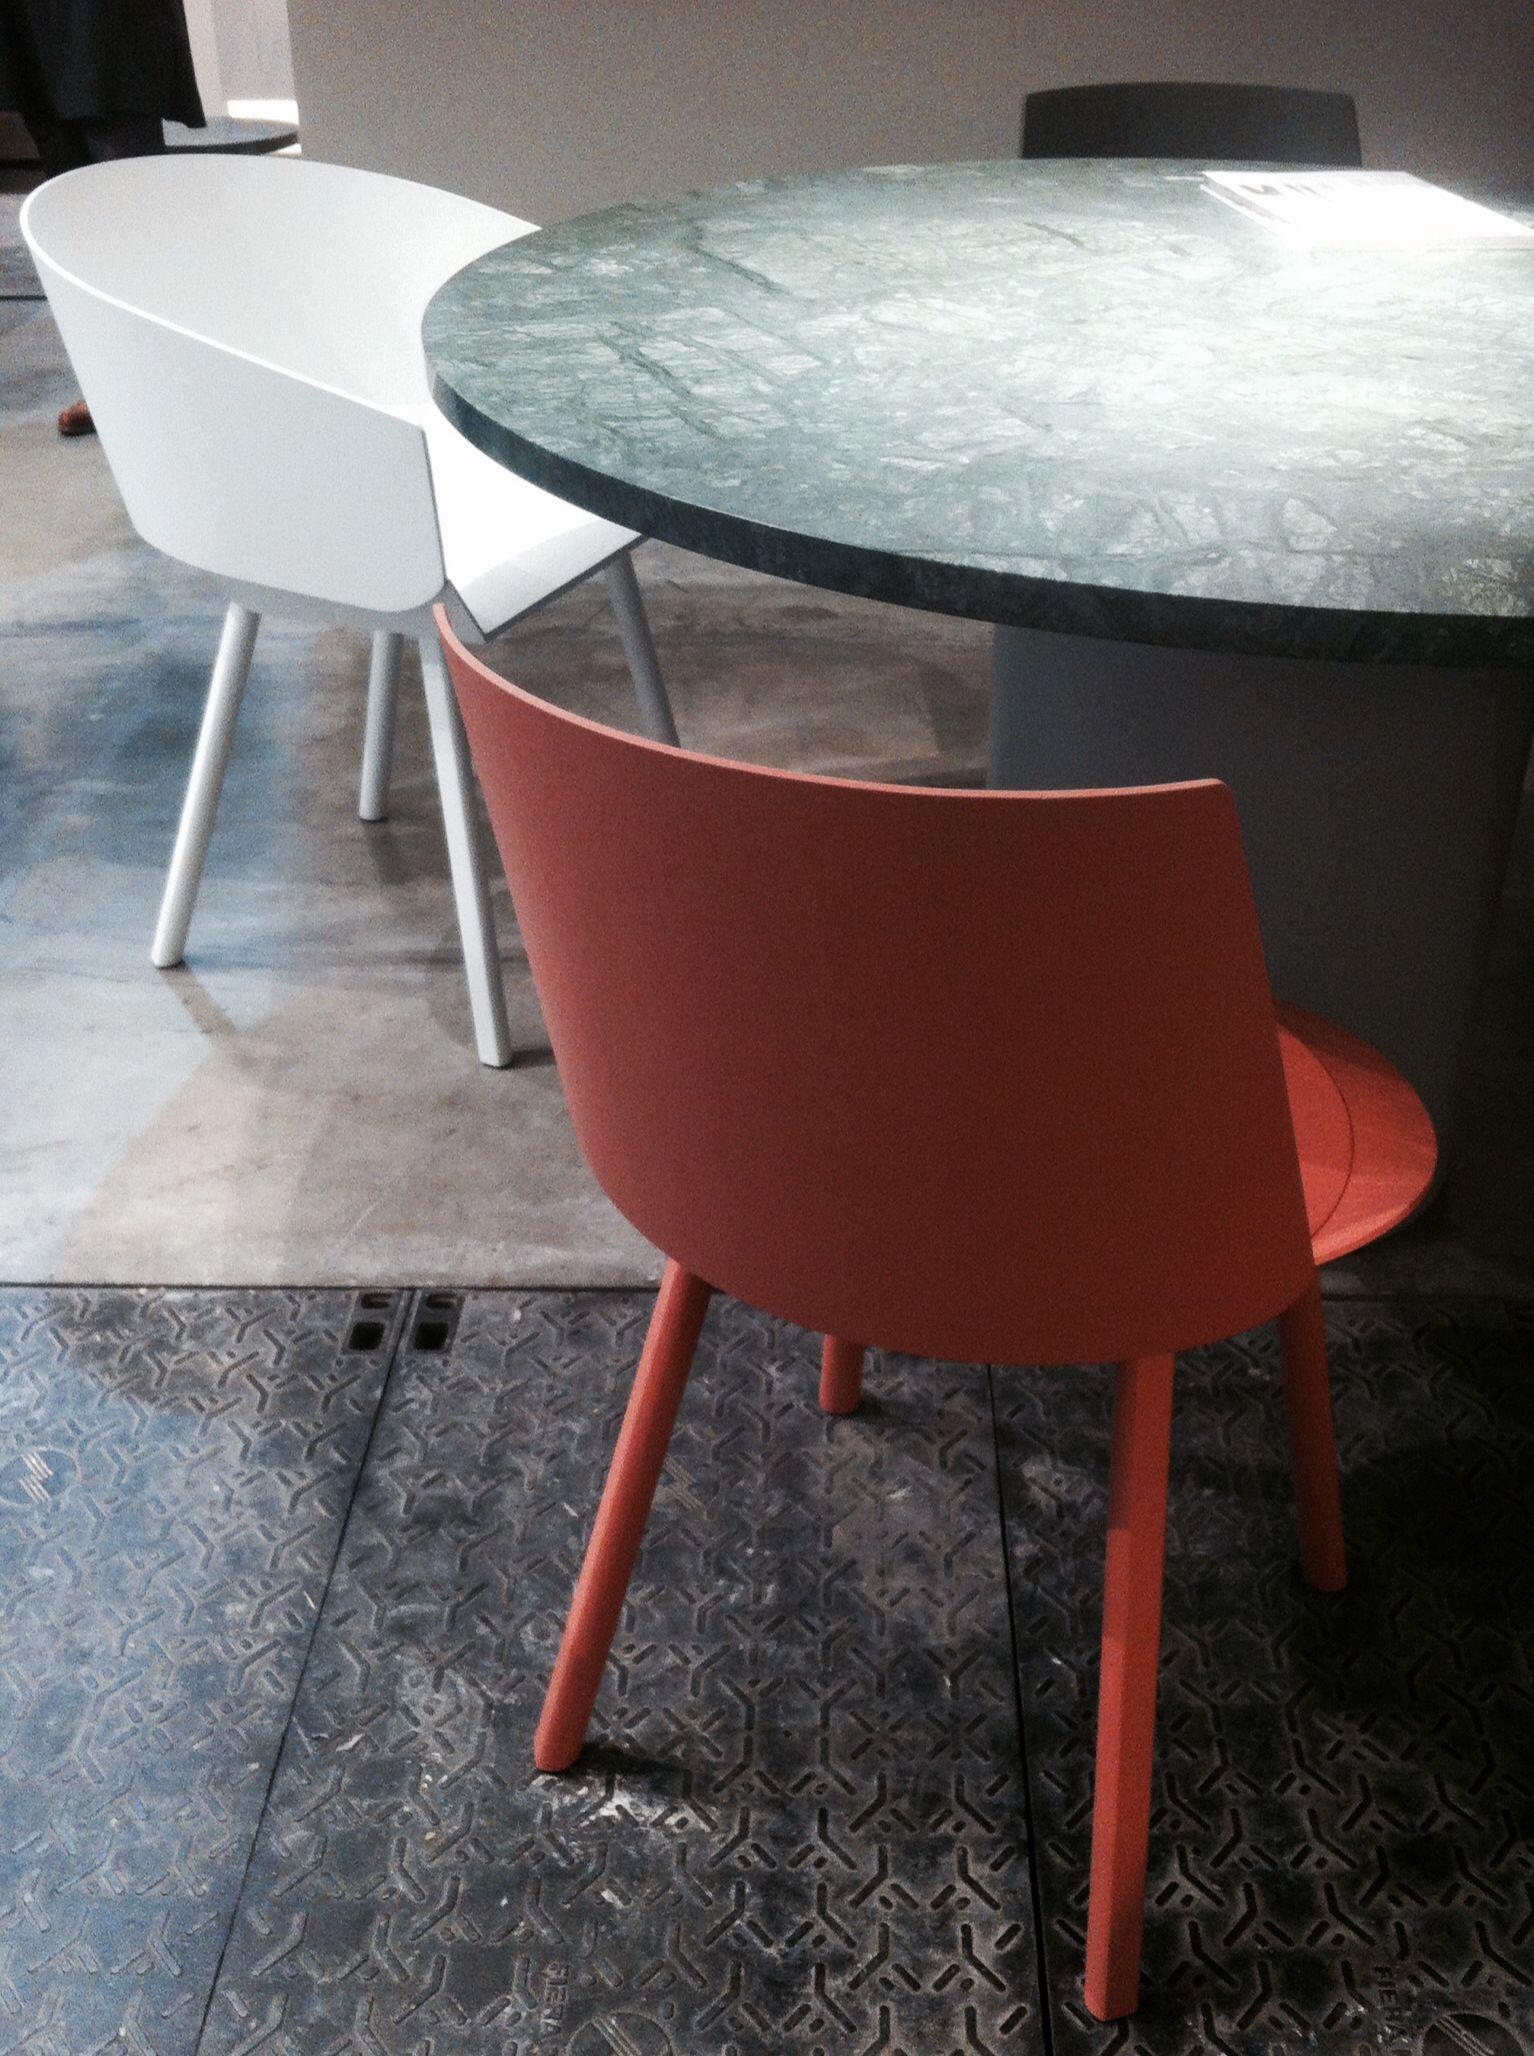 Edha interieur furniture pinterest interiors for Edha interieur amsterdam